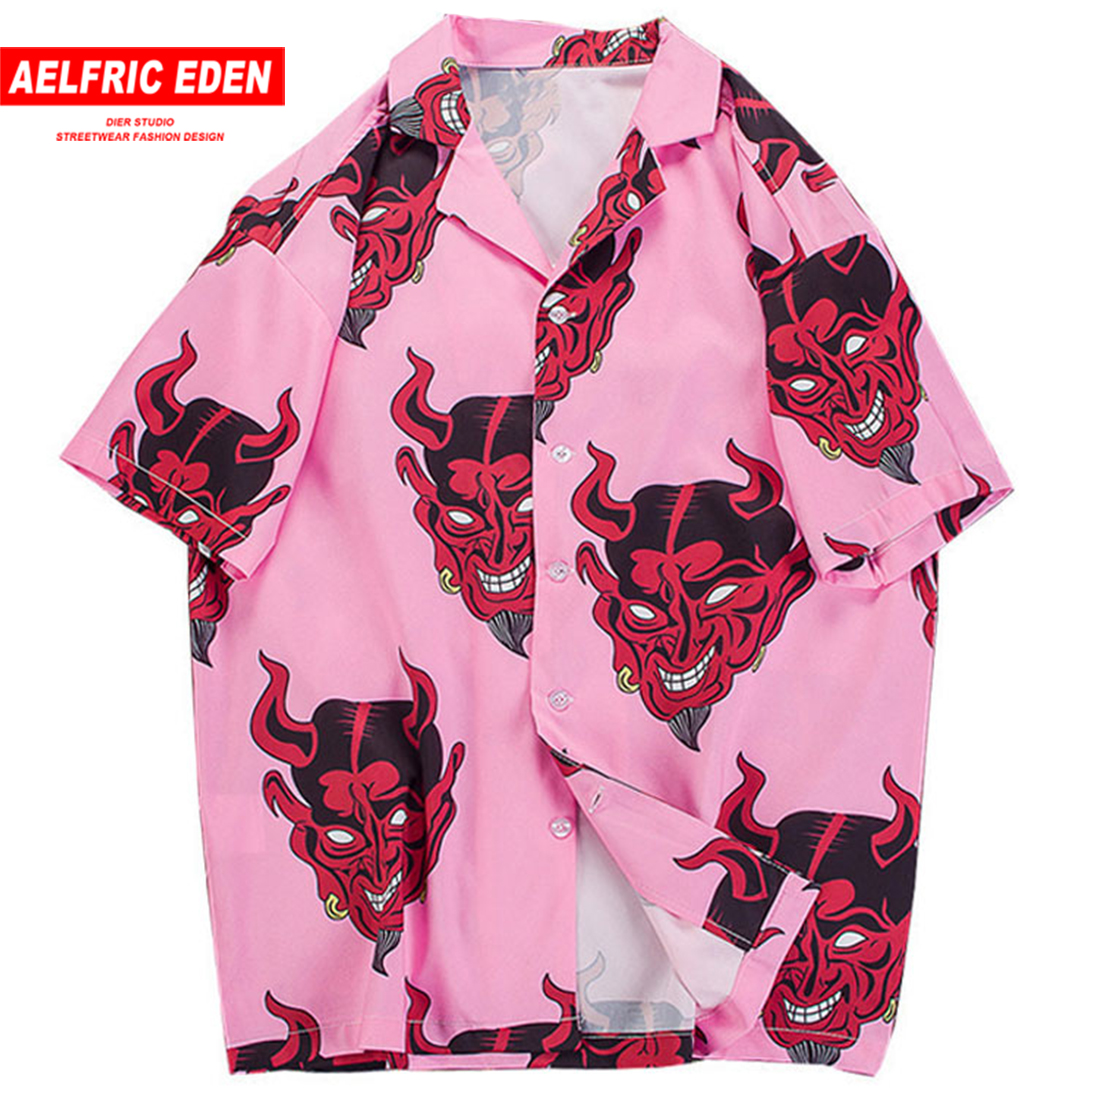 Aelfric Eden Devil Hawaiian Shirts Men 2019 3D Print Summer Beach Short Sleeve Tops Loose Harajuku Shirt Hip Hop Streetwear